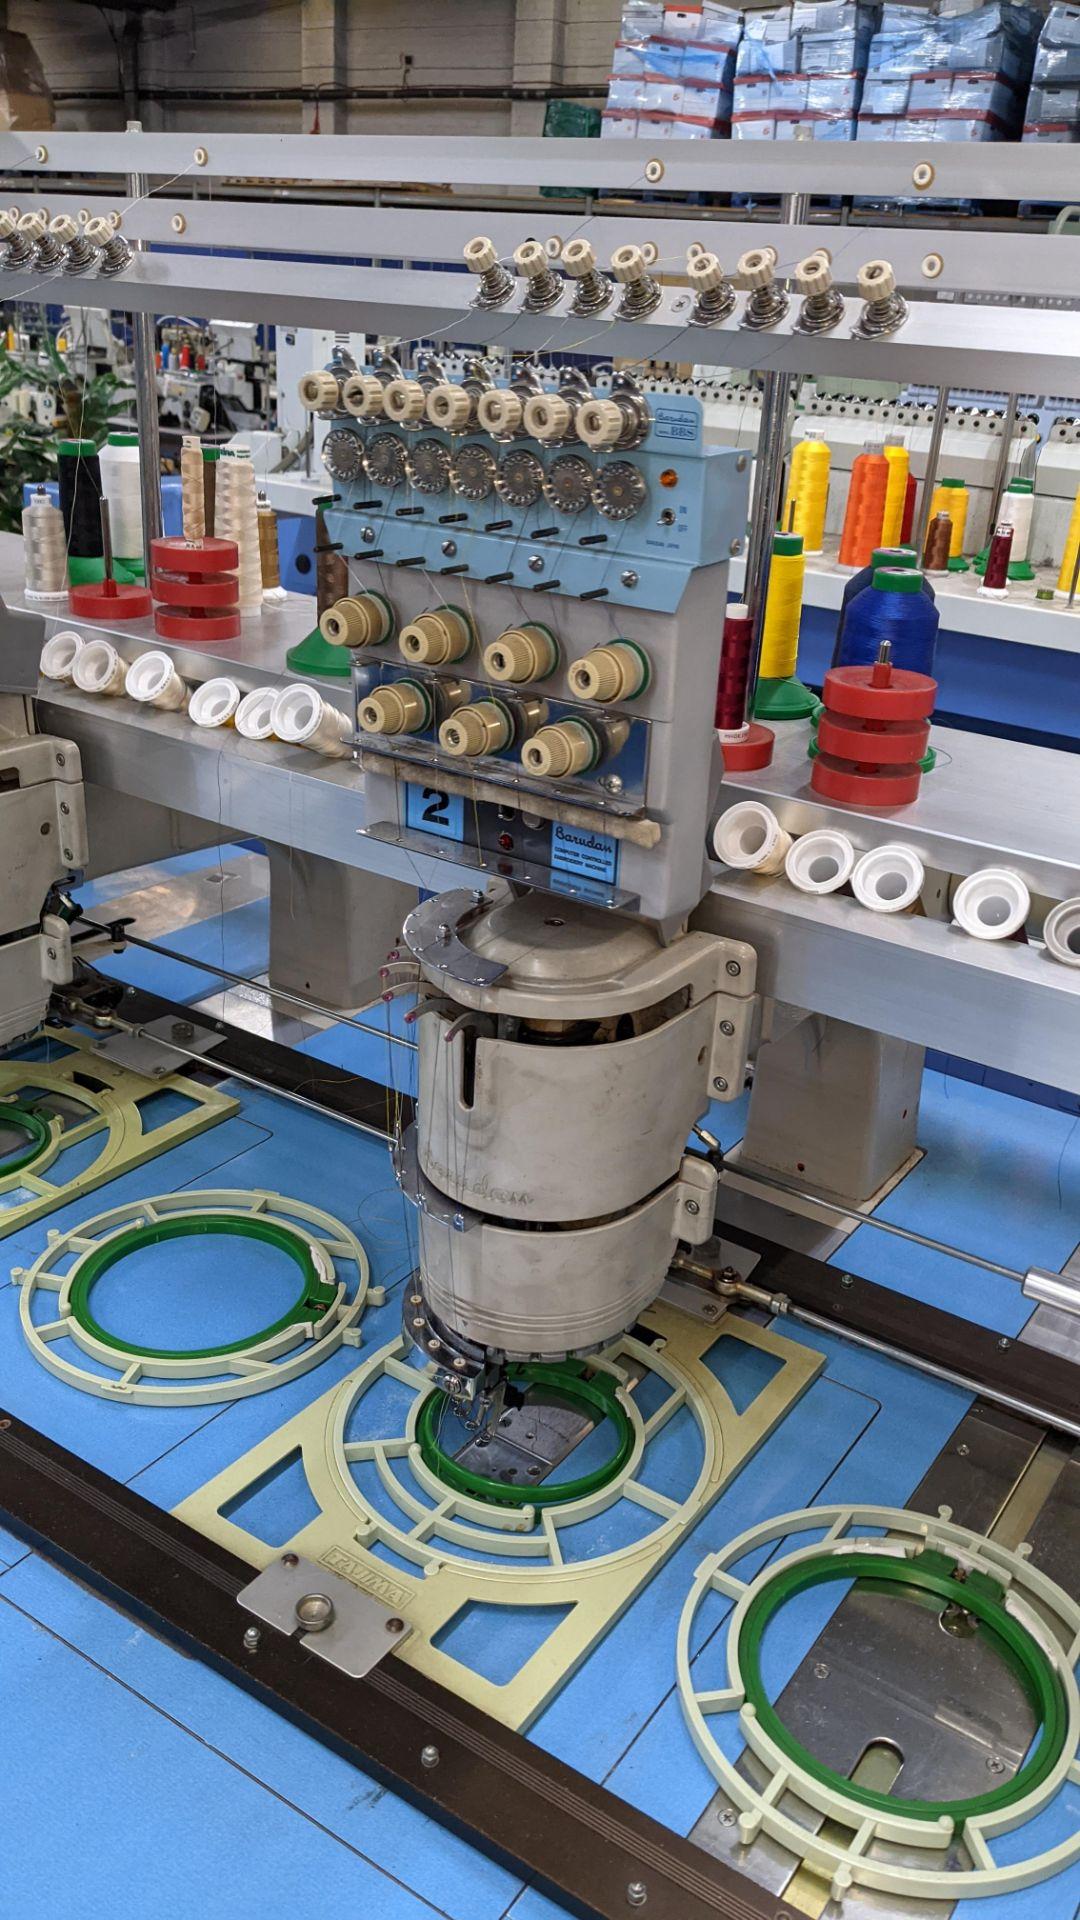 Barudan 4 head embroidery machine, model BEAT 804TYS, 7 needles per head - Image 11 of 24